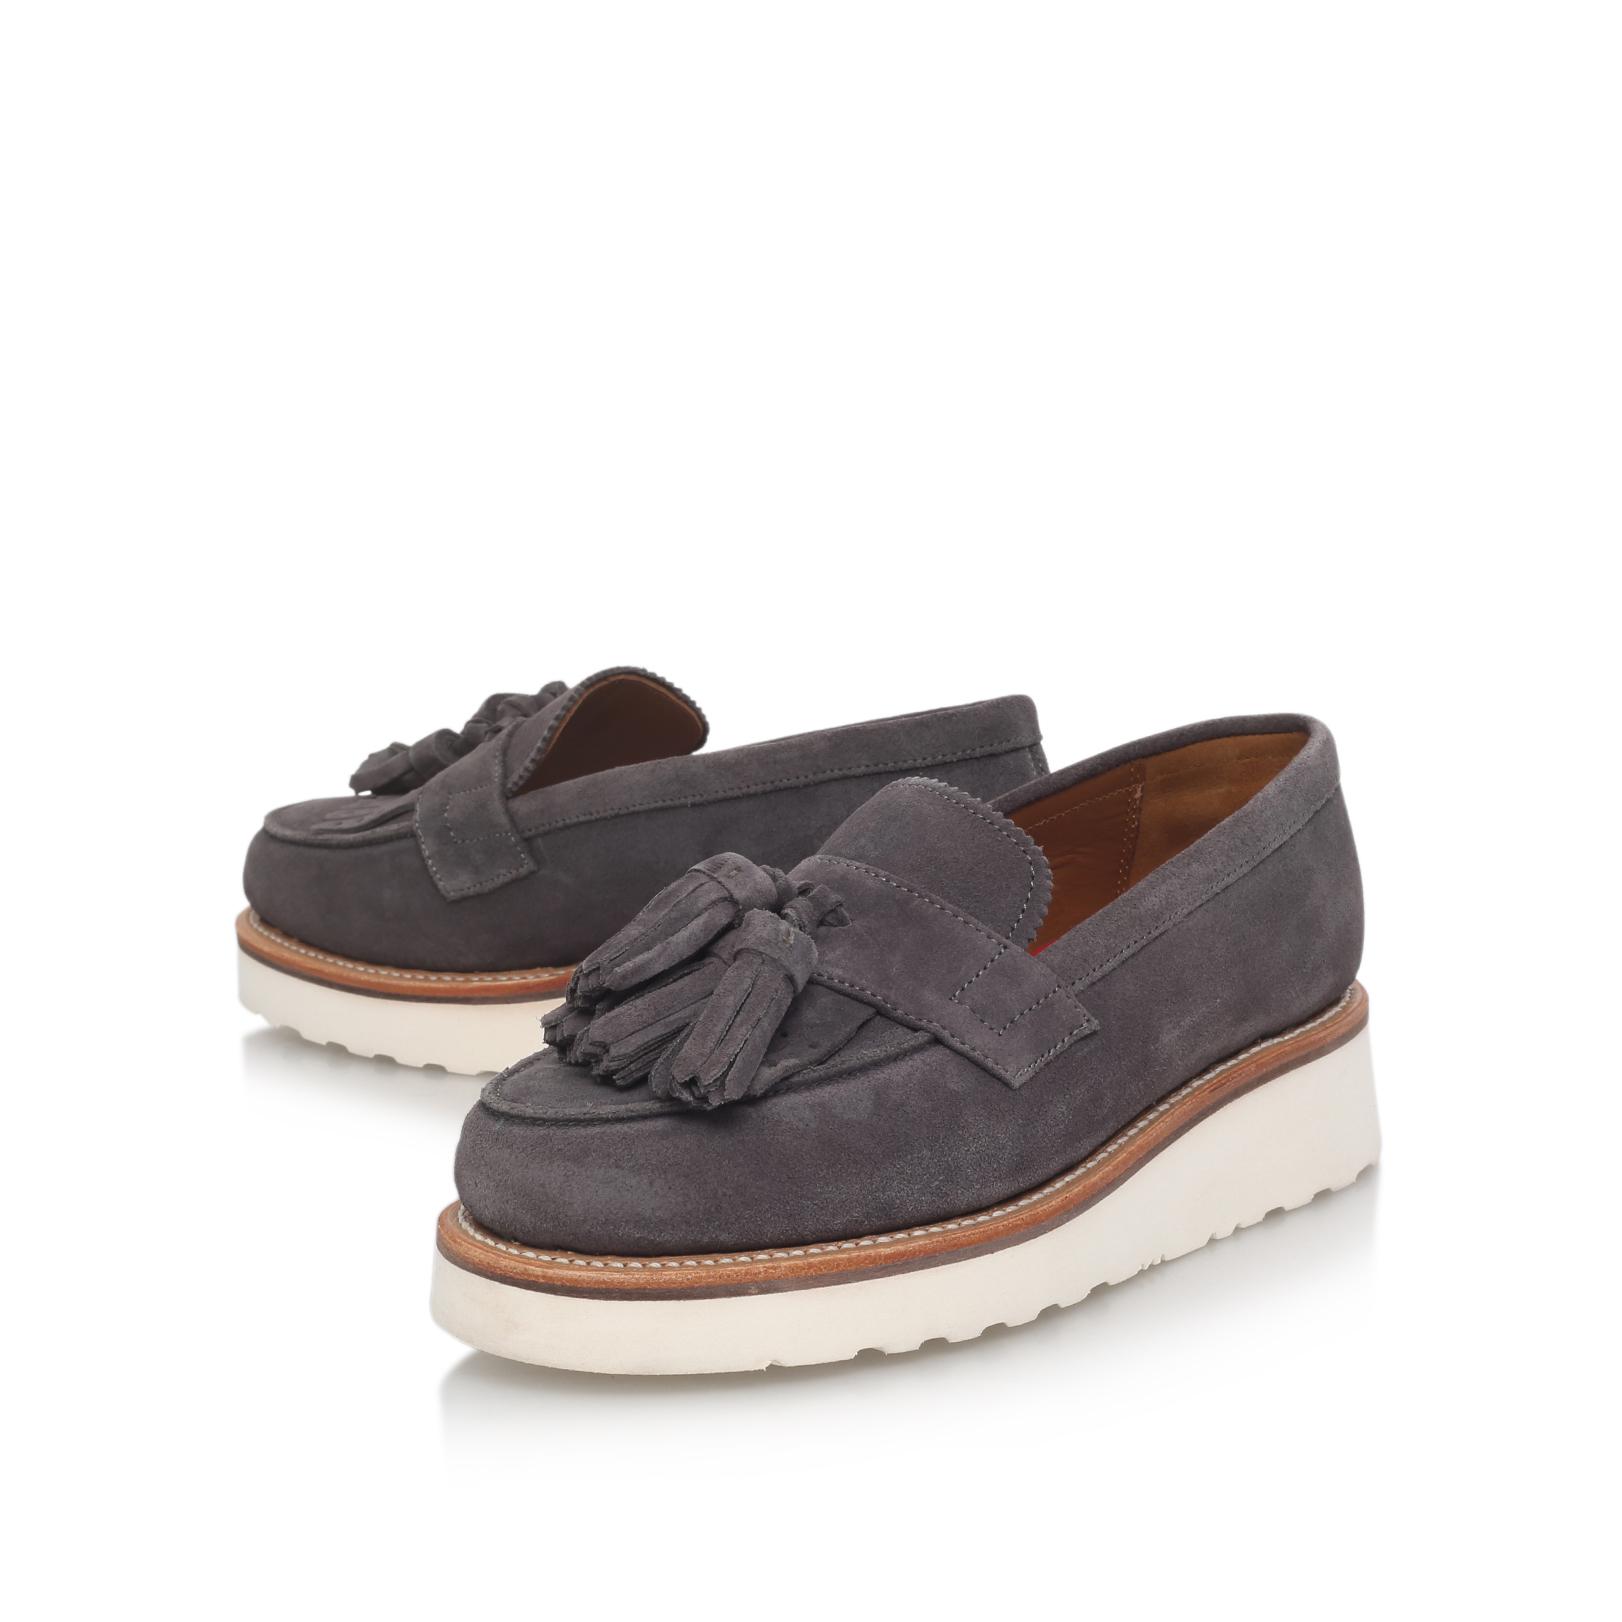 86e5dc6d642 CLARA Grenson Clara Grey Suede Loafers Flatform by GRENSON